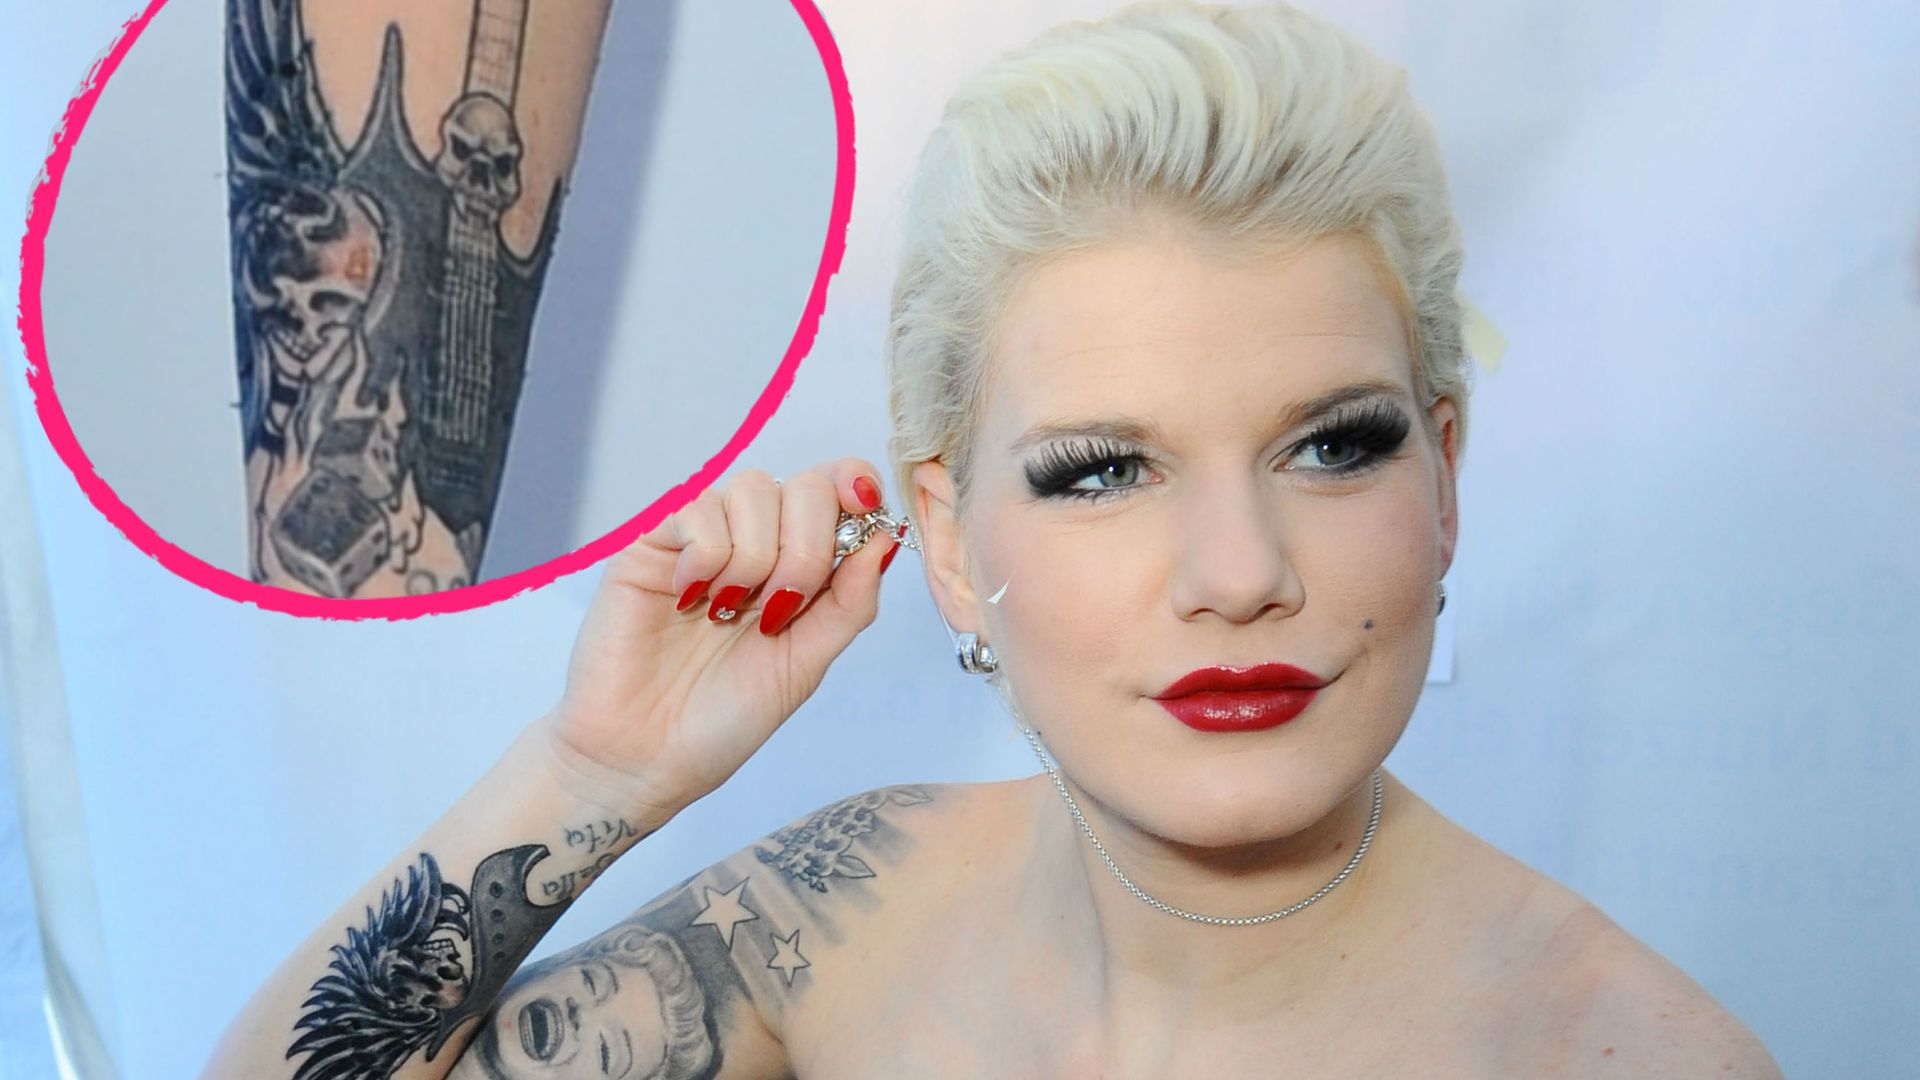 Nacktrodeln Melanie Mller enthllt neues Tattoo  Promiflashde